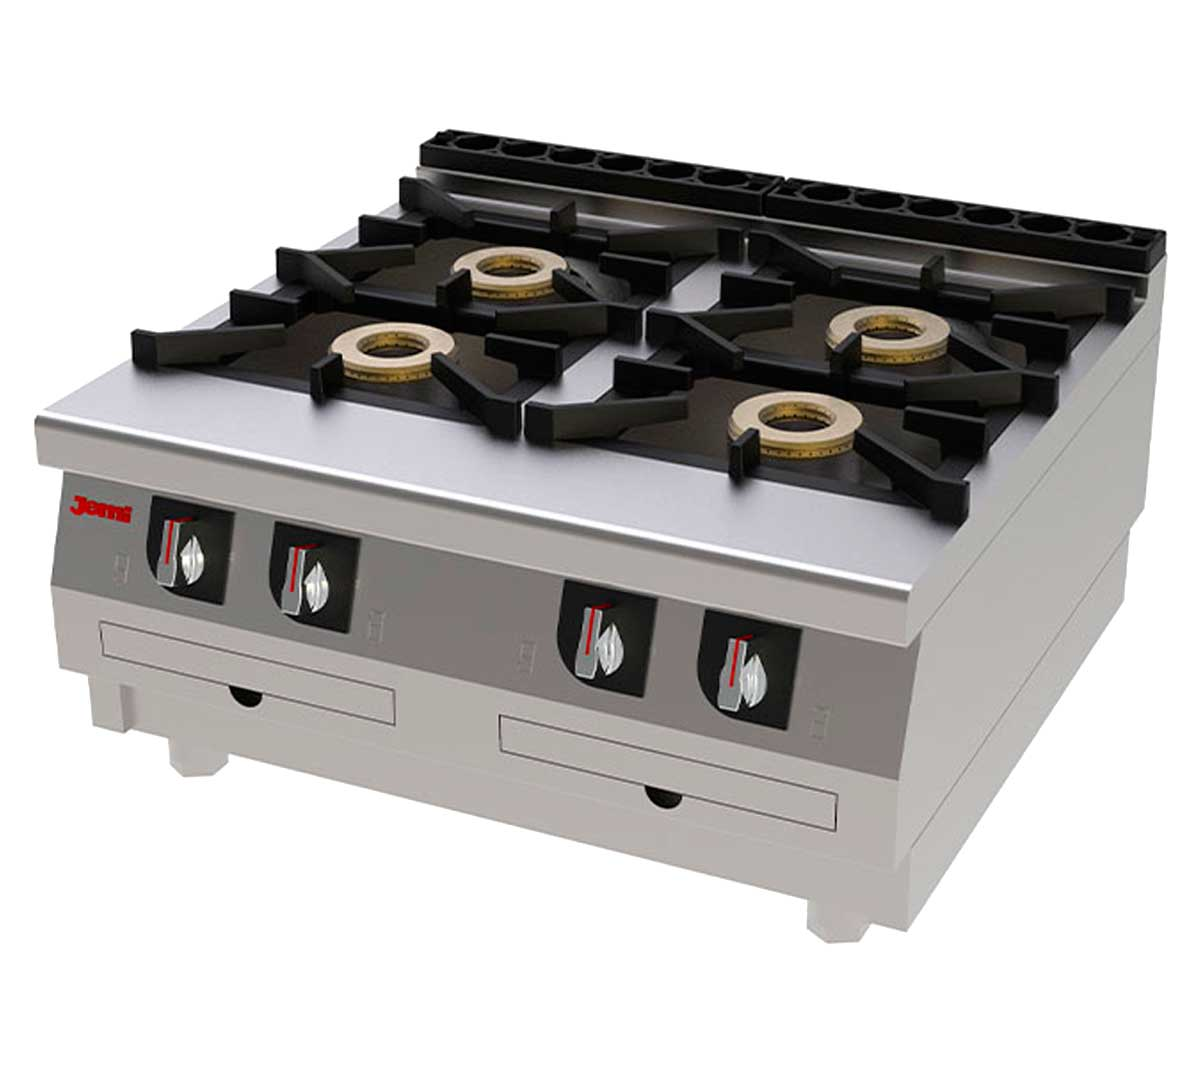 Cocina serie 750 s7 sobremesa gas de jemi - Fogones de butano ...